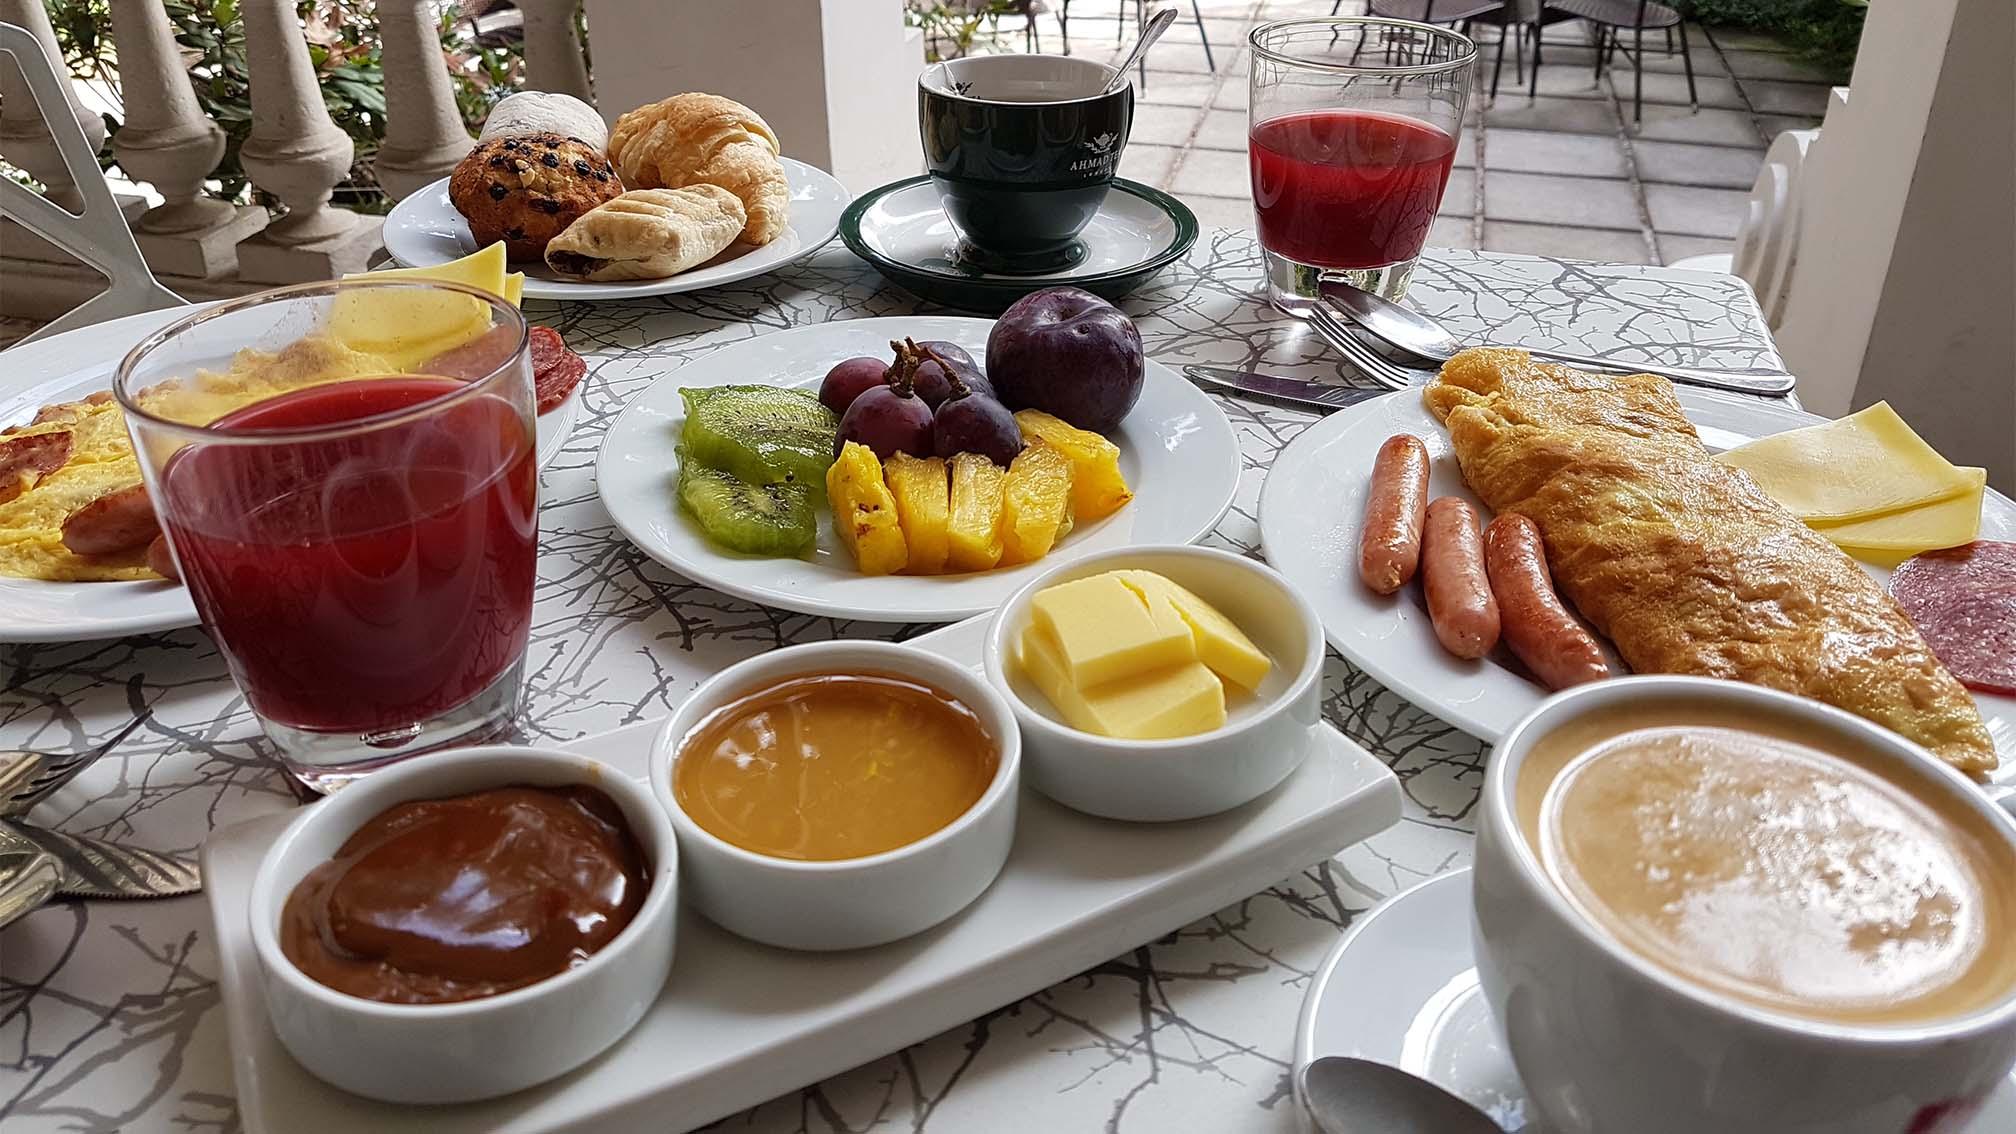 Sunday brunch matildas hotel boutique for Brunch boutique hotel